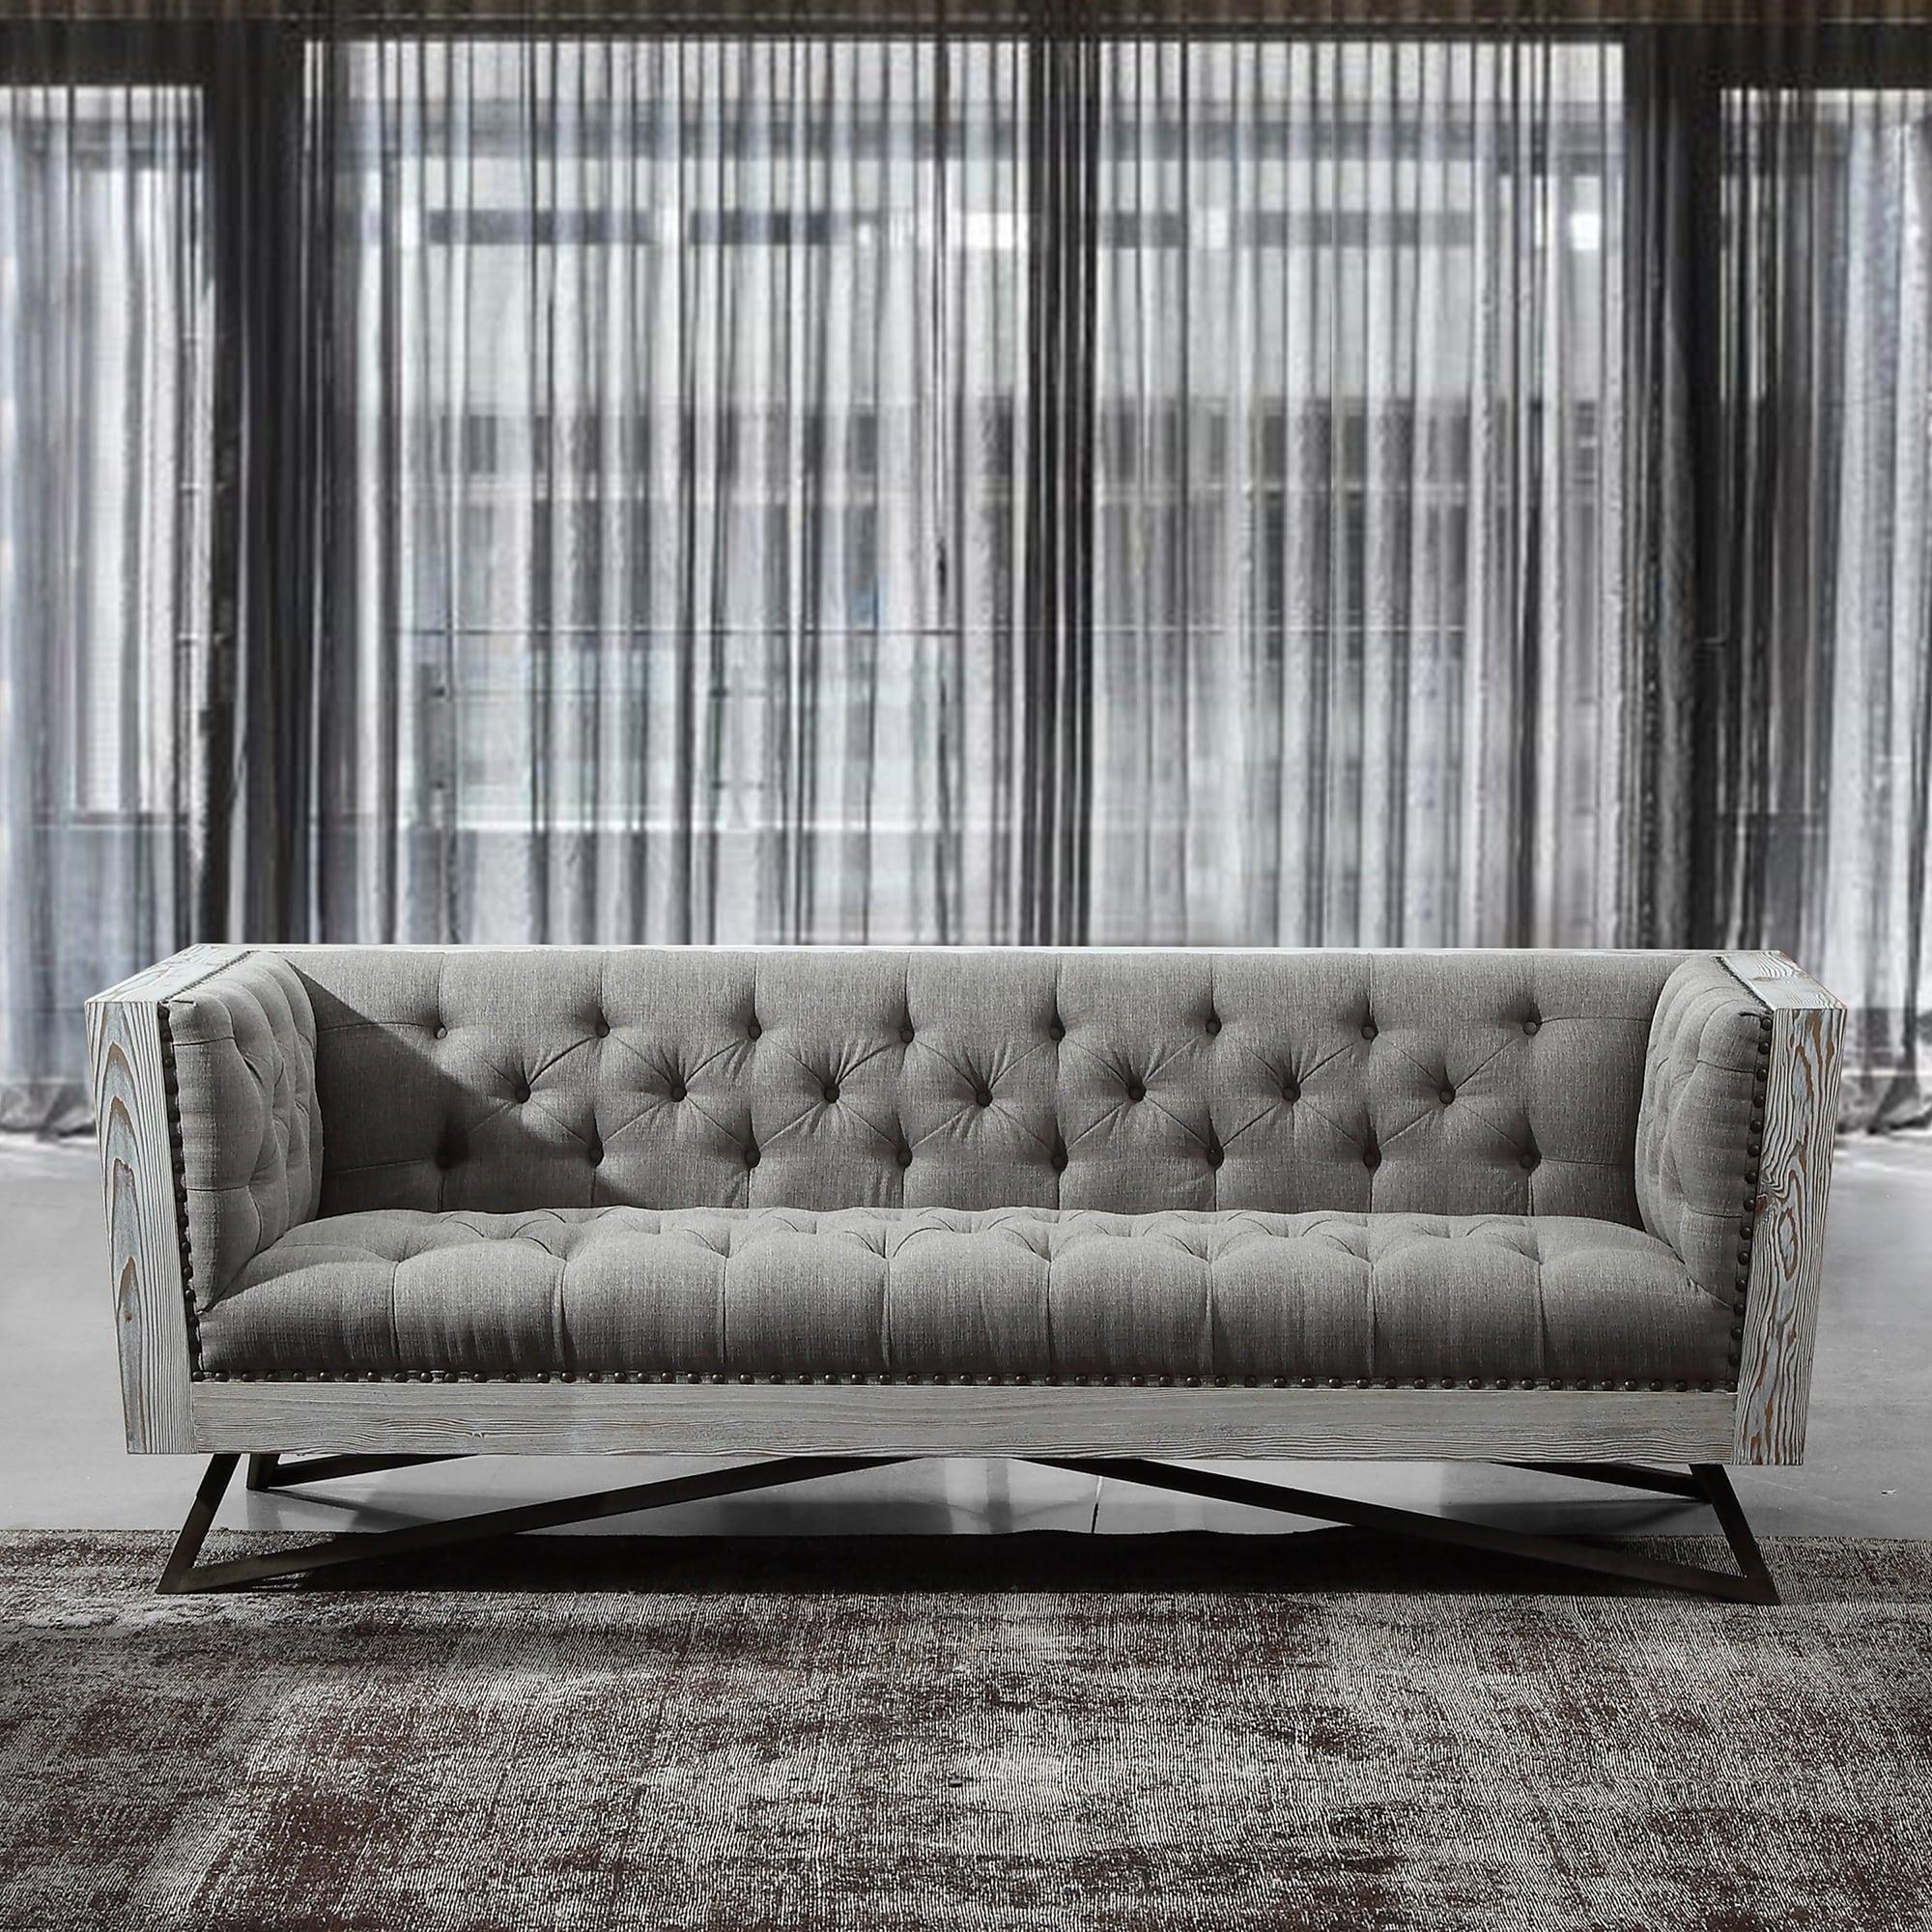 Armen living regis sofa in grey fabric with black metal finish legs